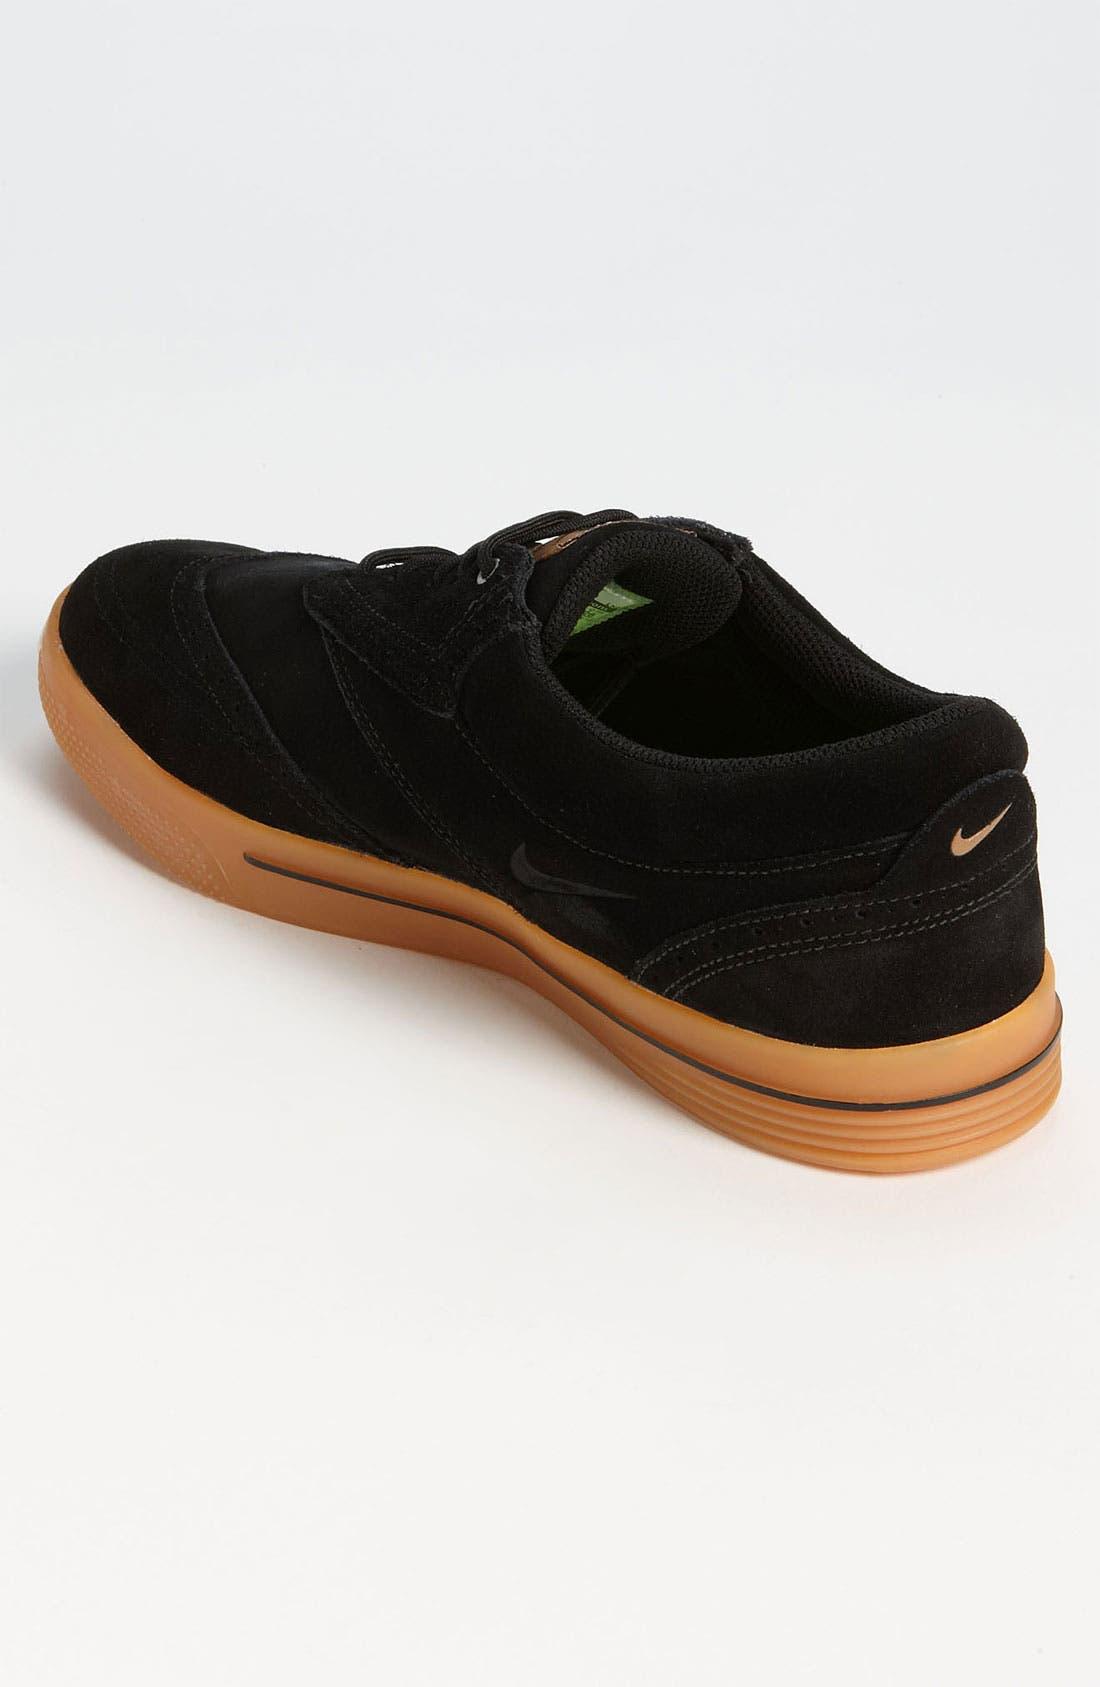 Alternate Image 2  - Nike 'Lunar Swingtip' Suede Golf Shoe (Men)